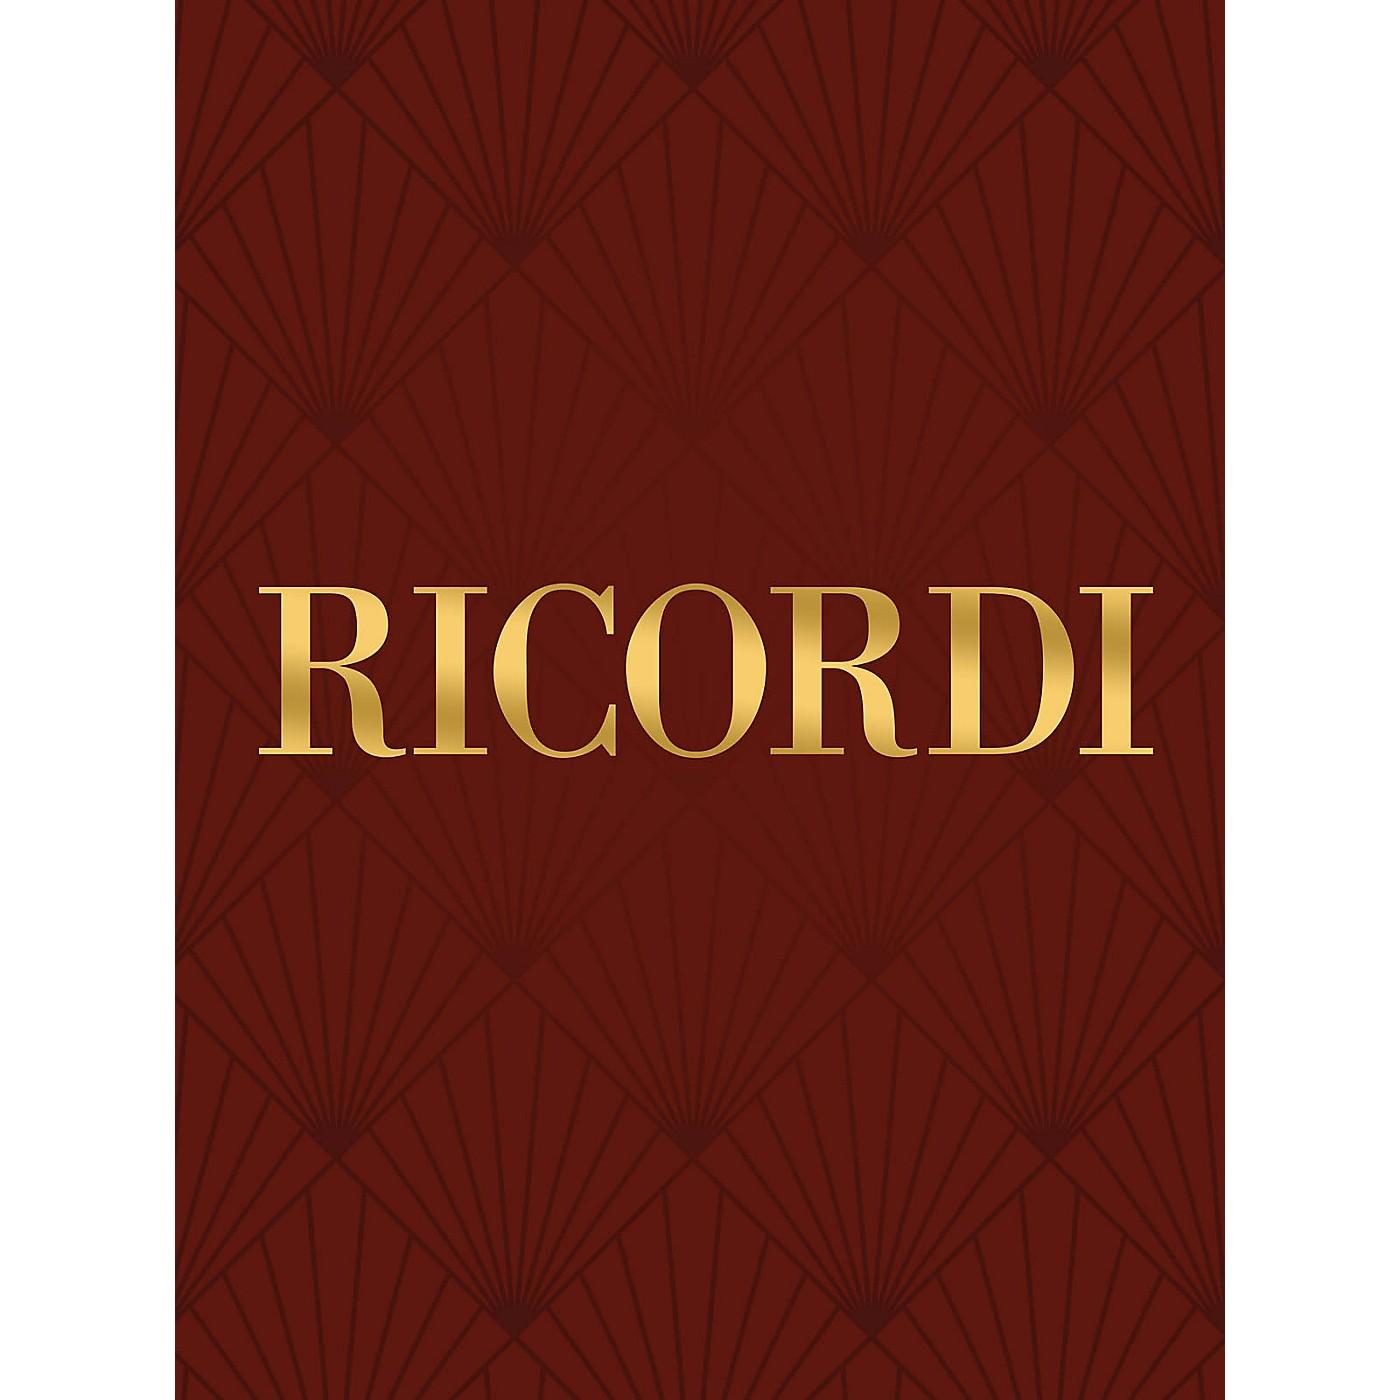 Ricordi Messa Di Requiem (Requiem Mass) Cloth, Lt/En Vocal Score by Gaetano Donizetti Edited by Vilmos Lesko thumbnail